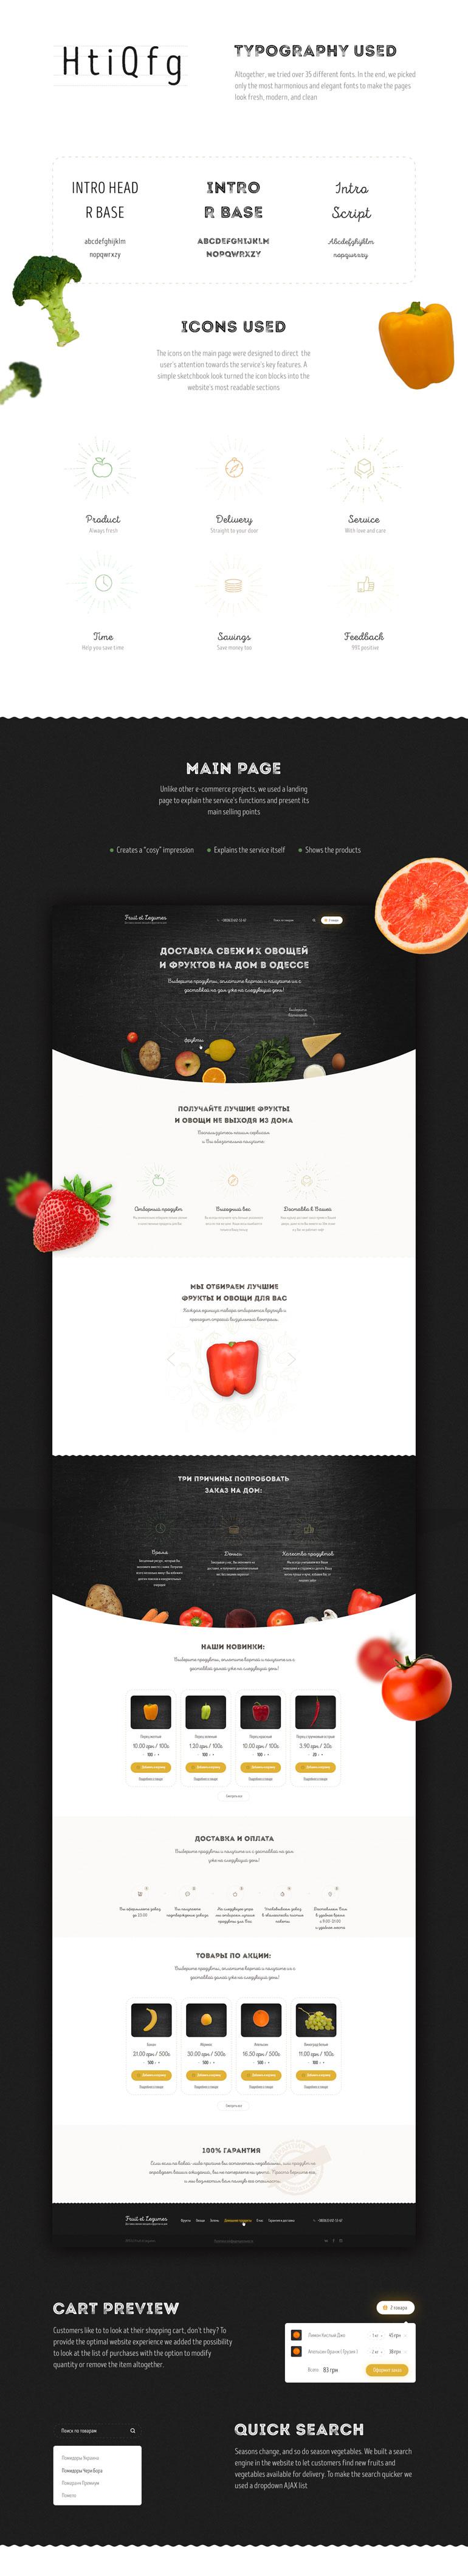 Creative_Website_Design_Inspiration_2016_009